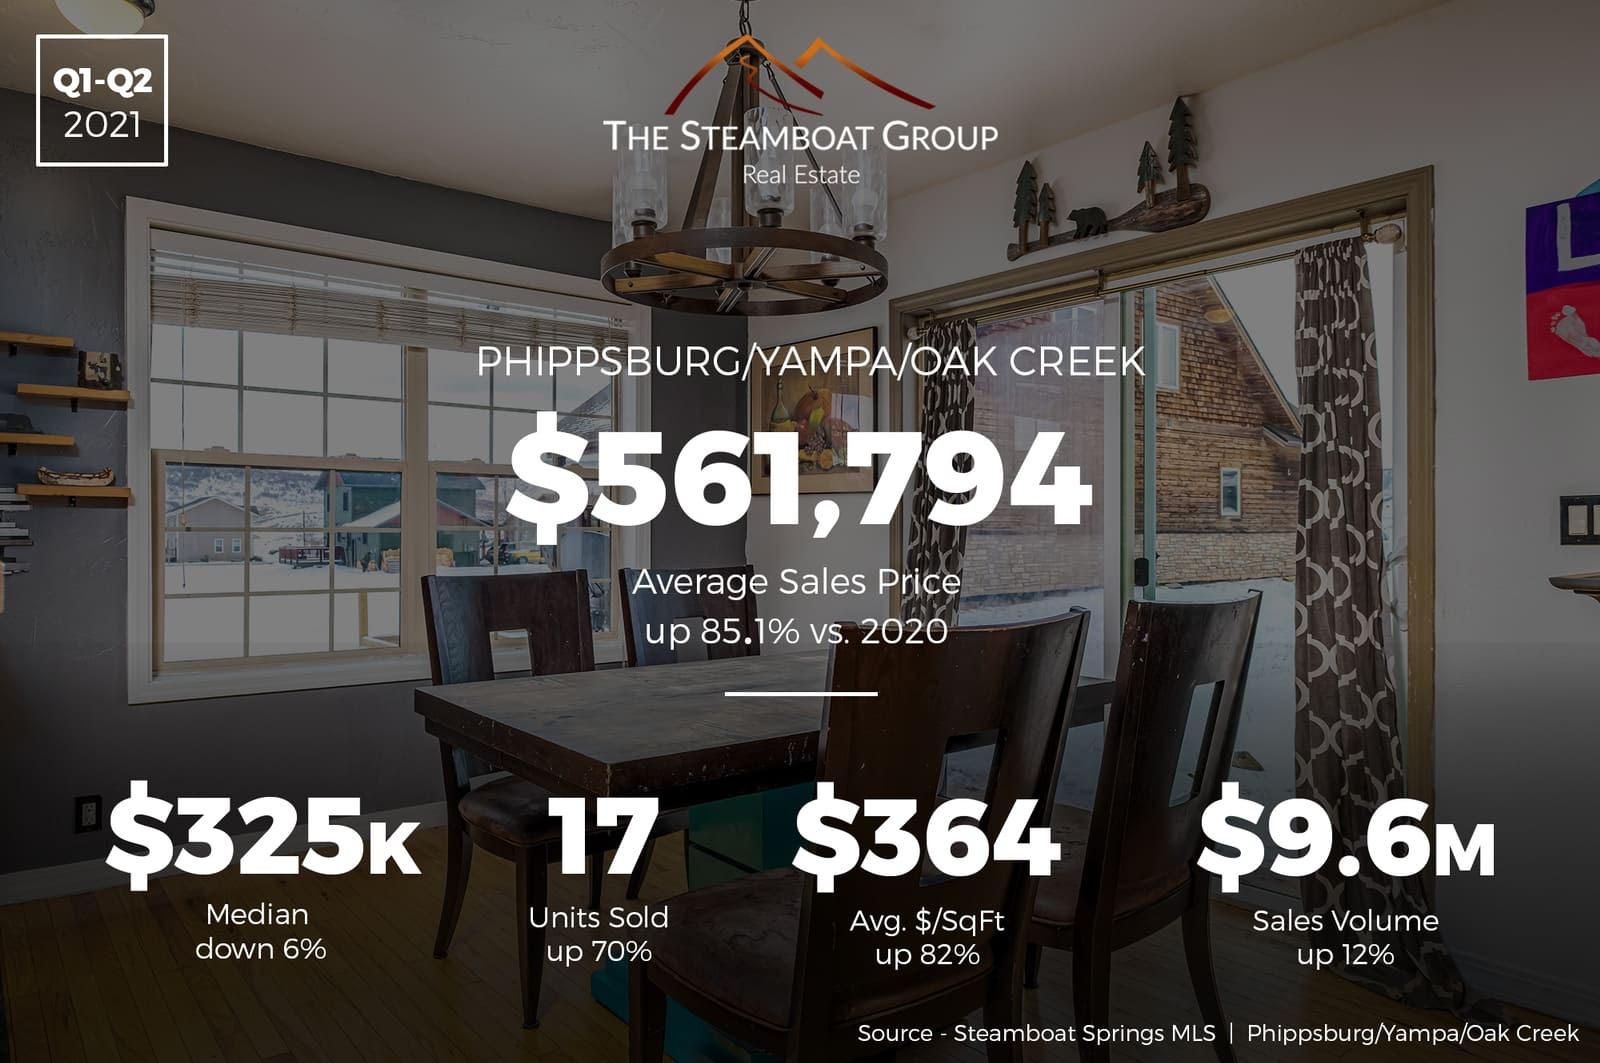 Market Update: 2021 Q2 Phippsburg /Yampa/Oak Creek Homes